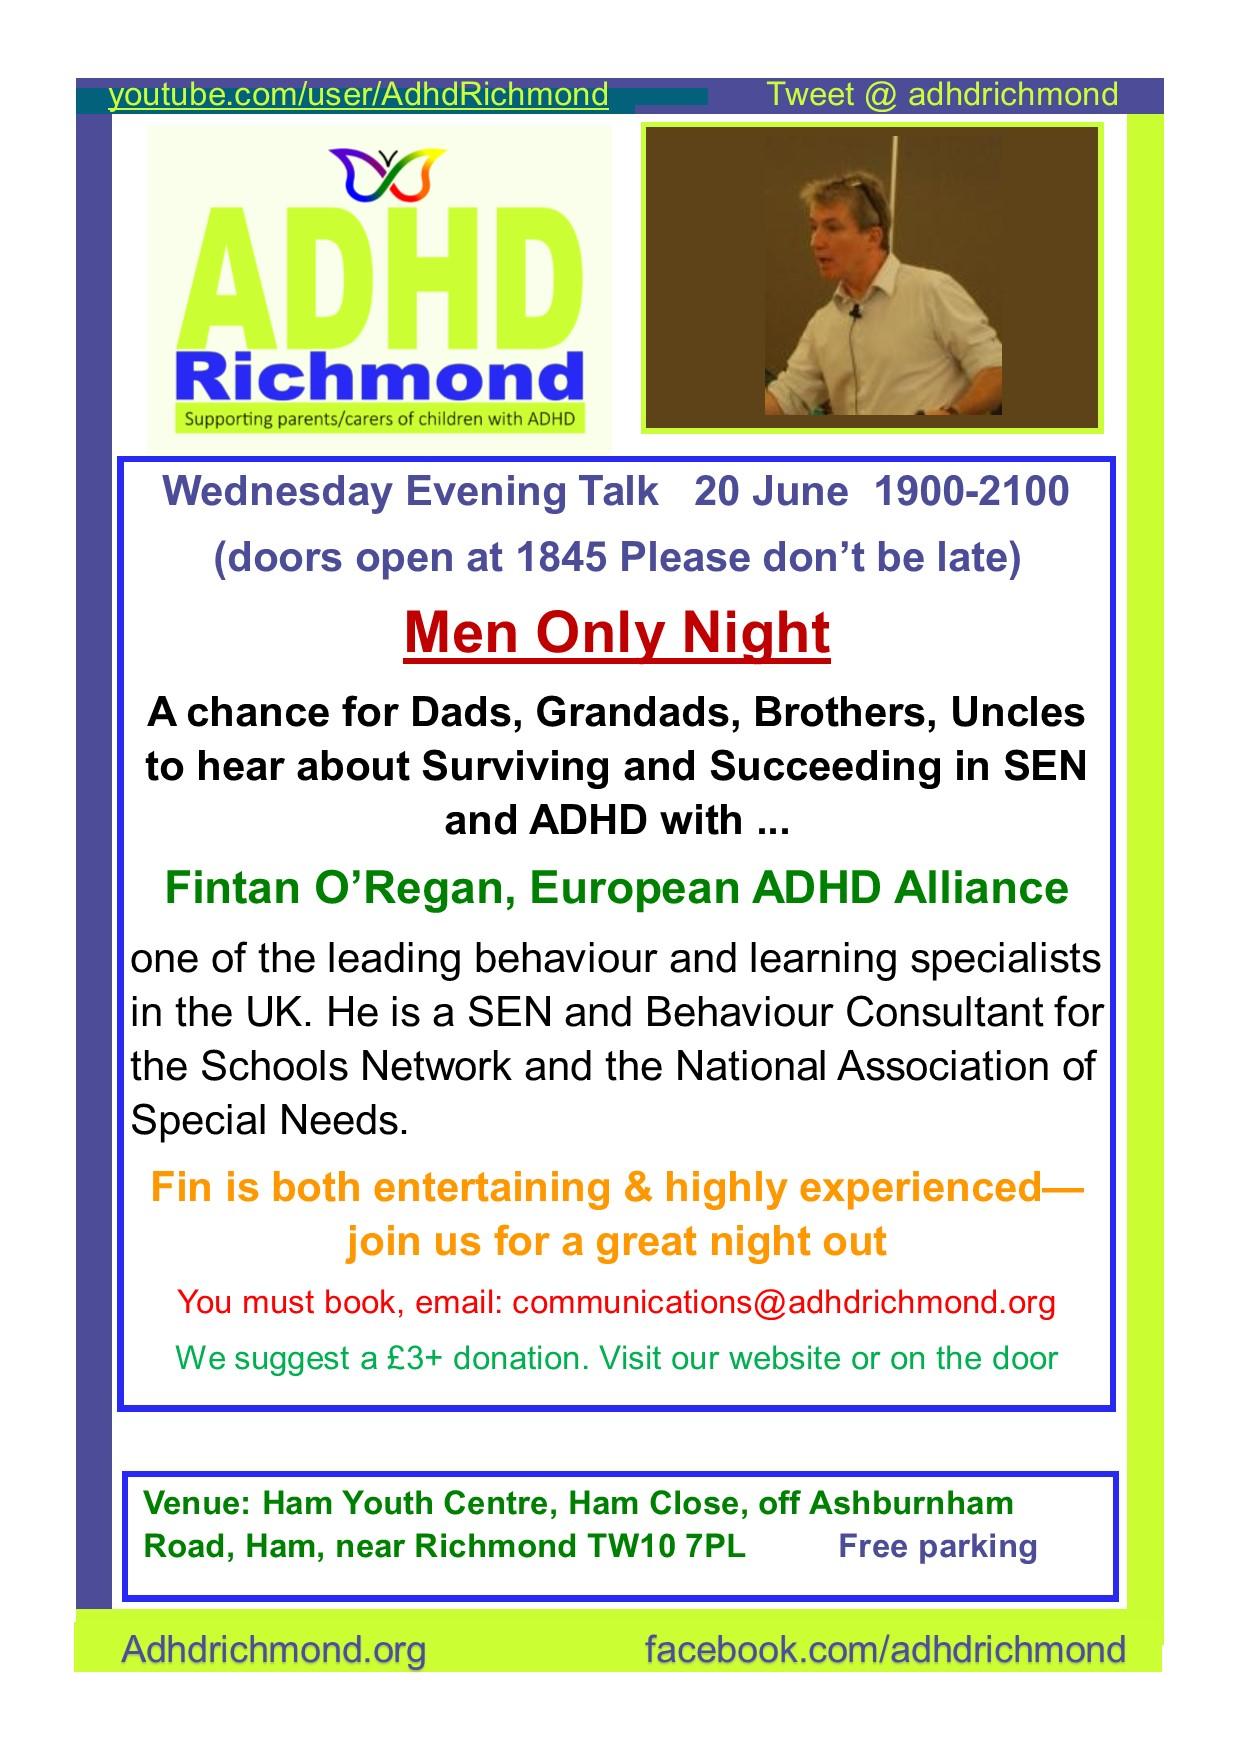 June 20 Wednesday evening